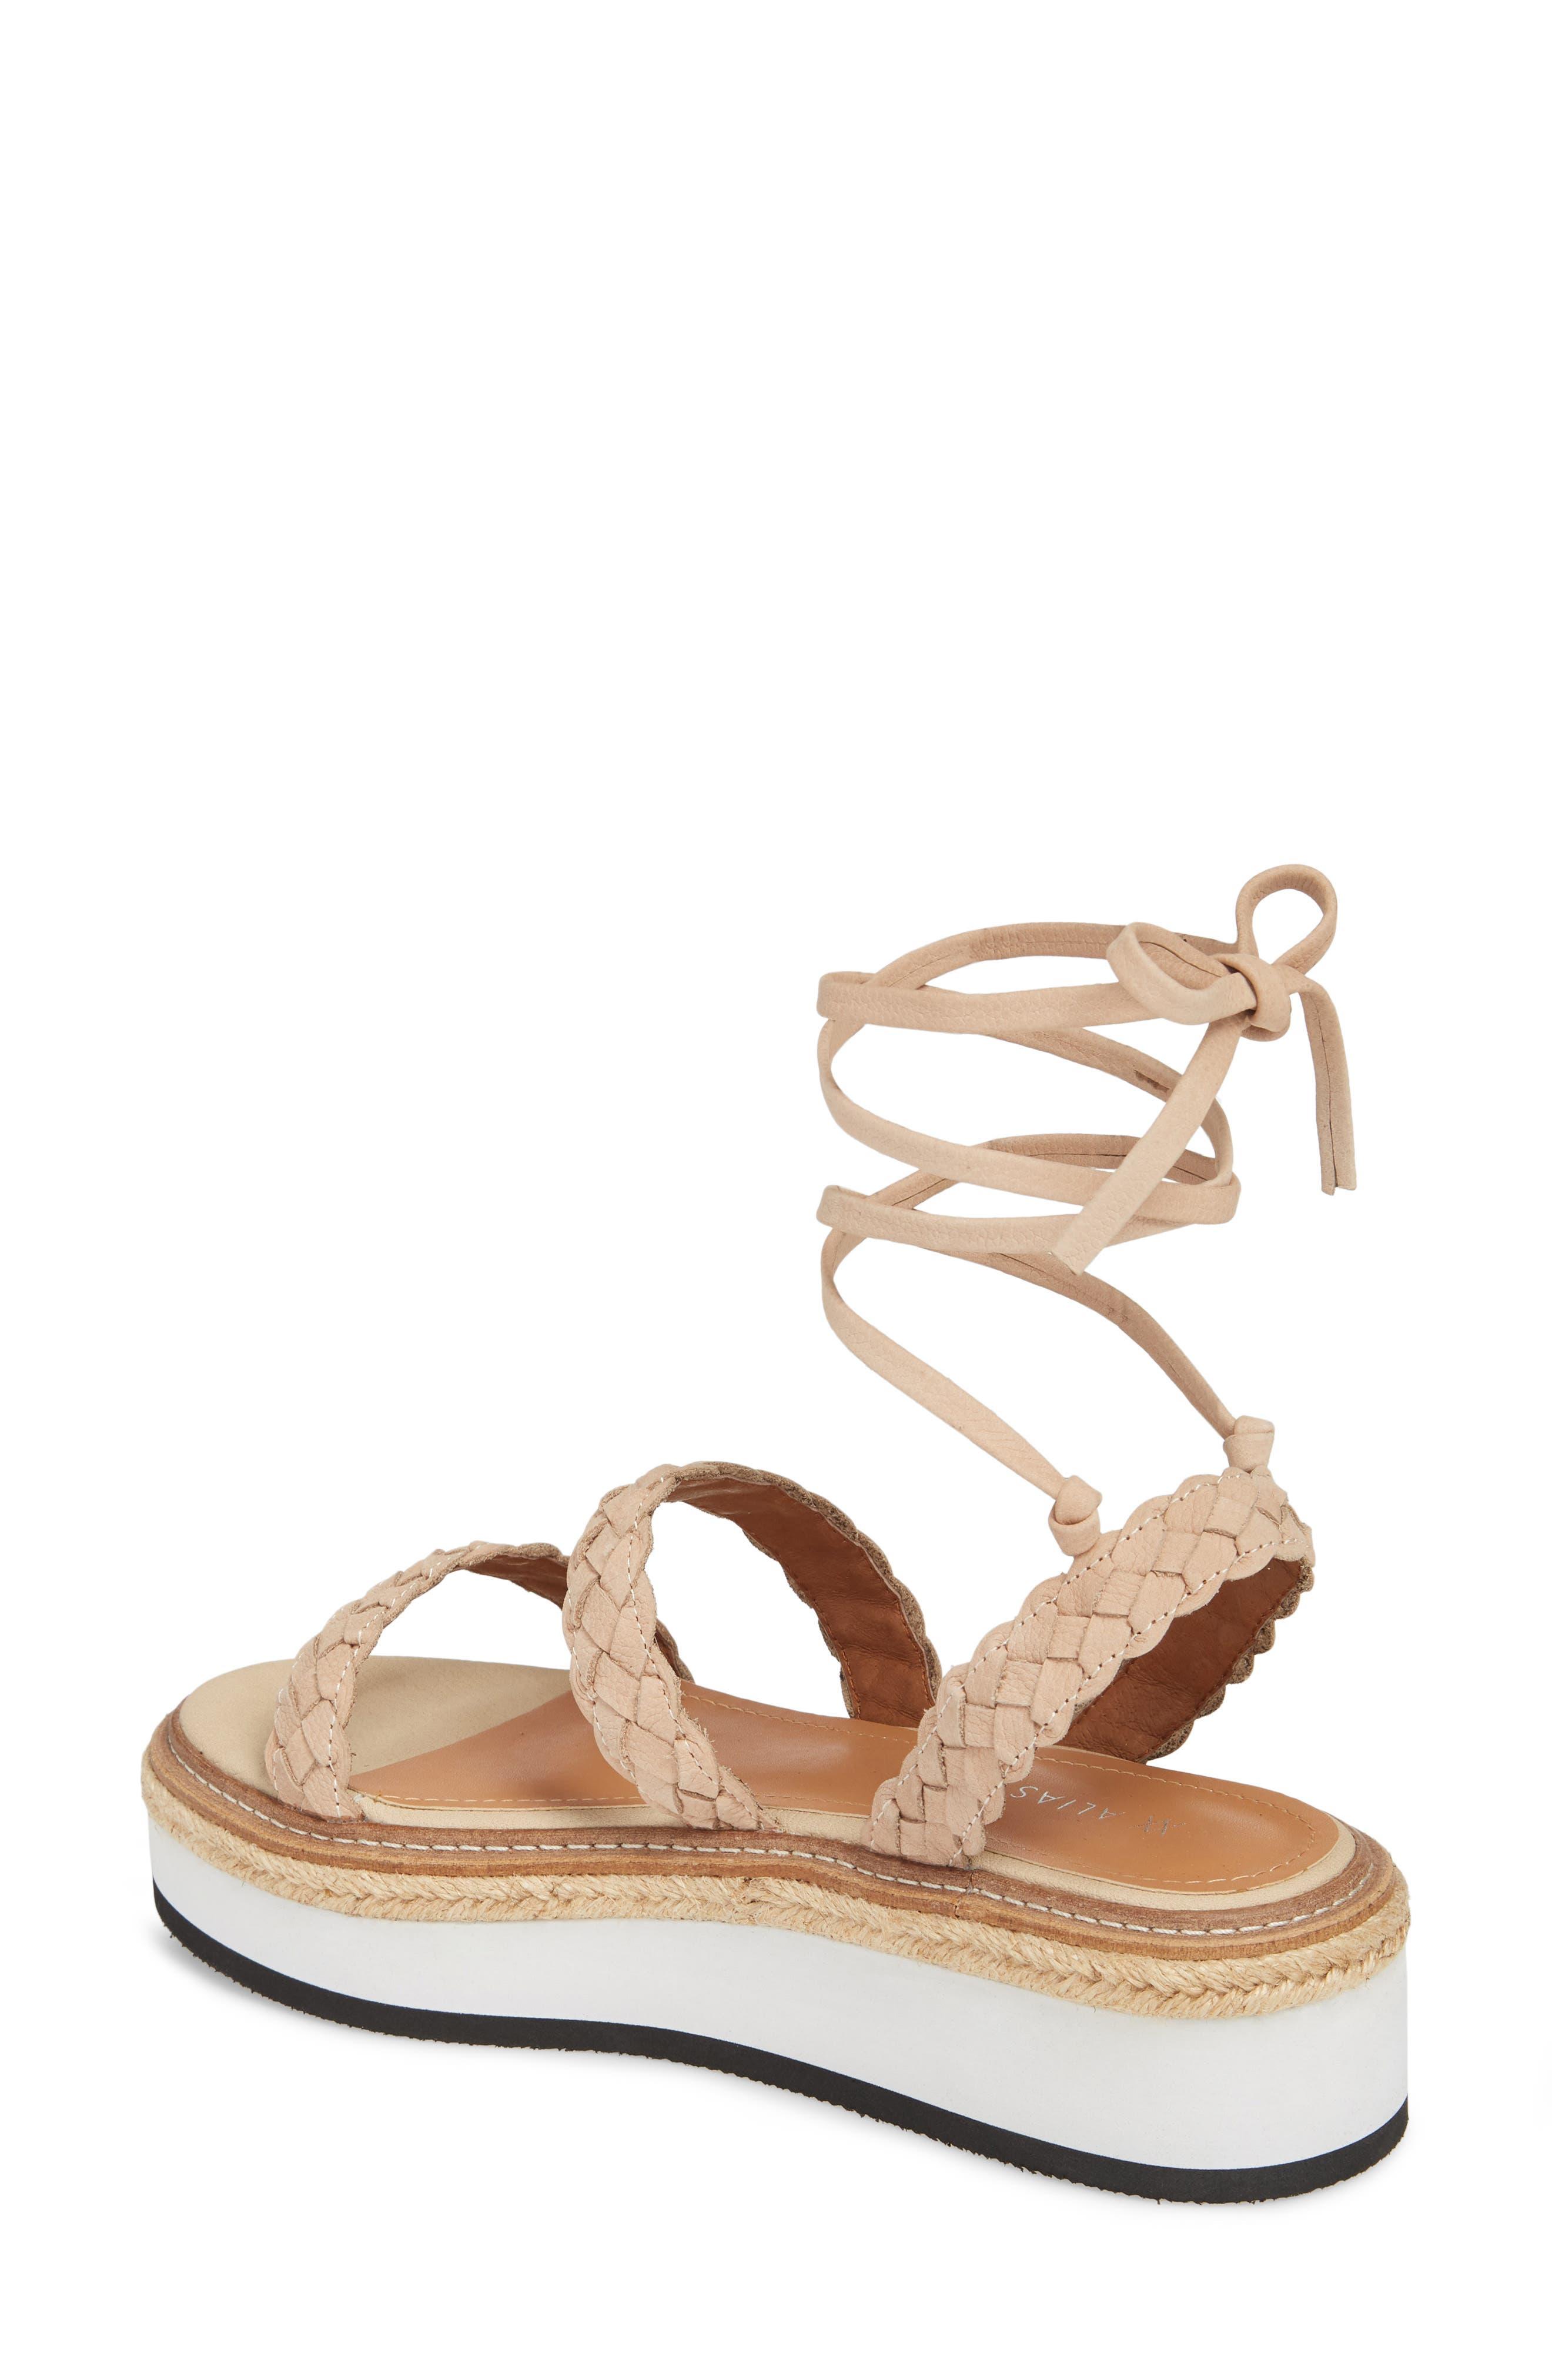 Nieve Braided Platform Sandal,                             Alternate thumbnail 2, color,                             Natural Leather